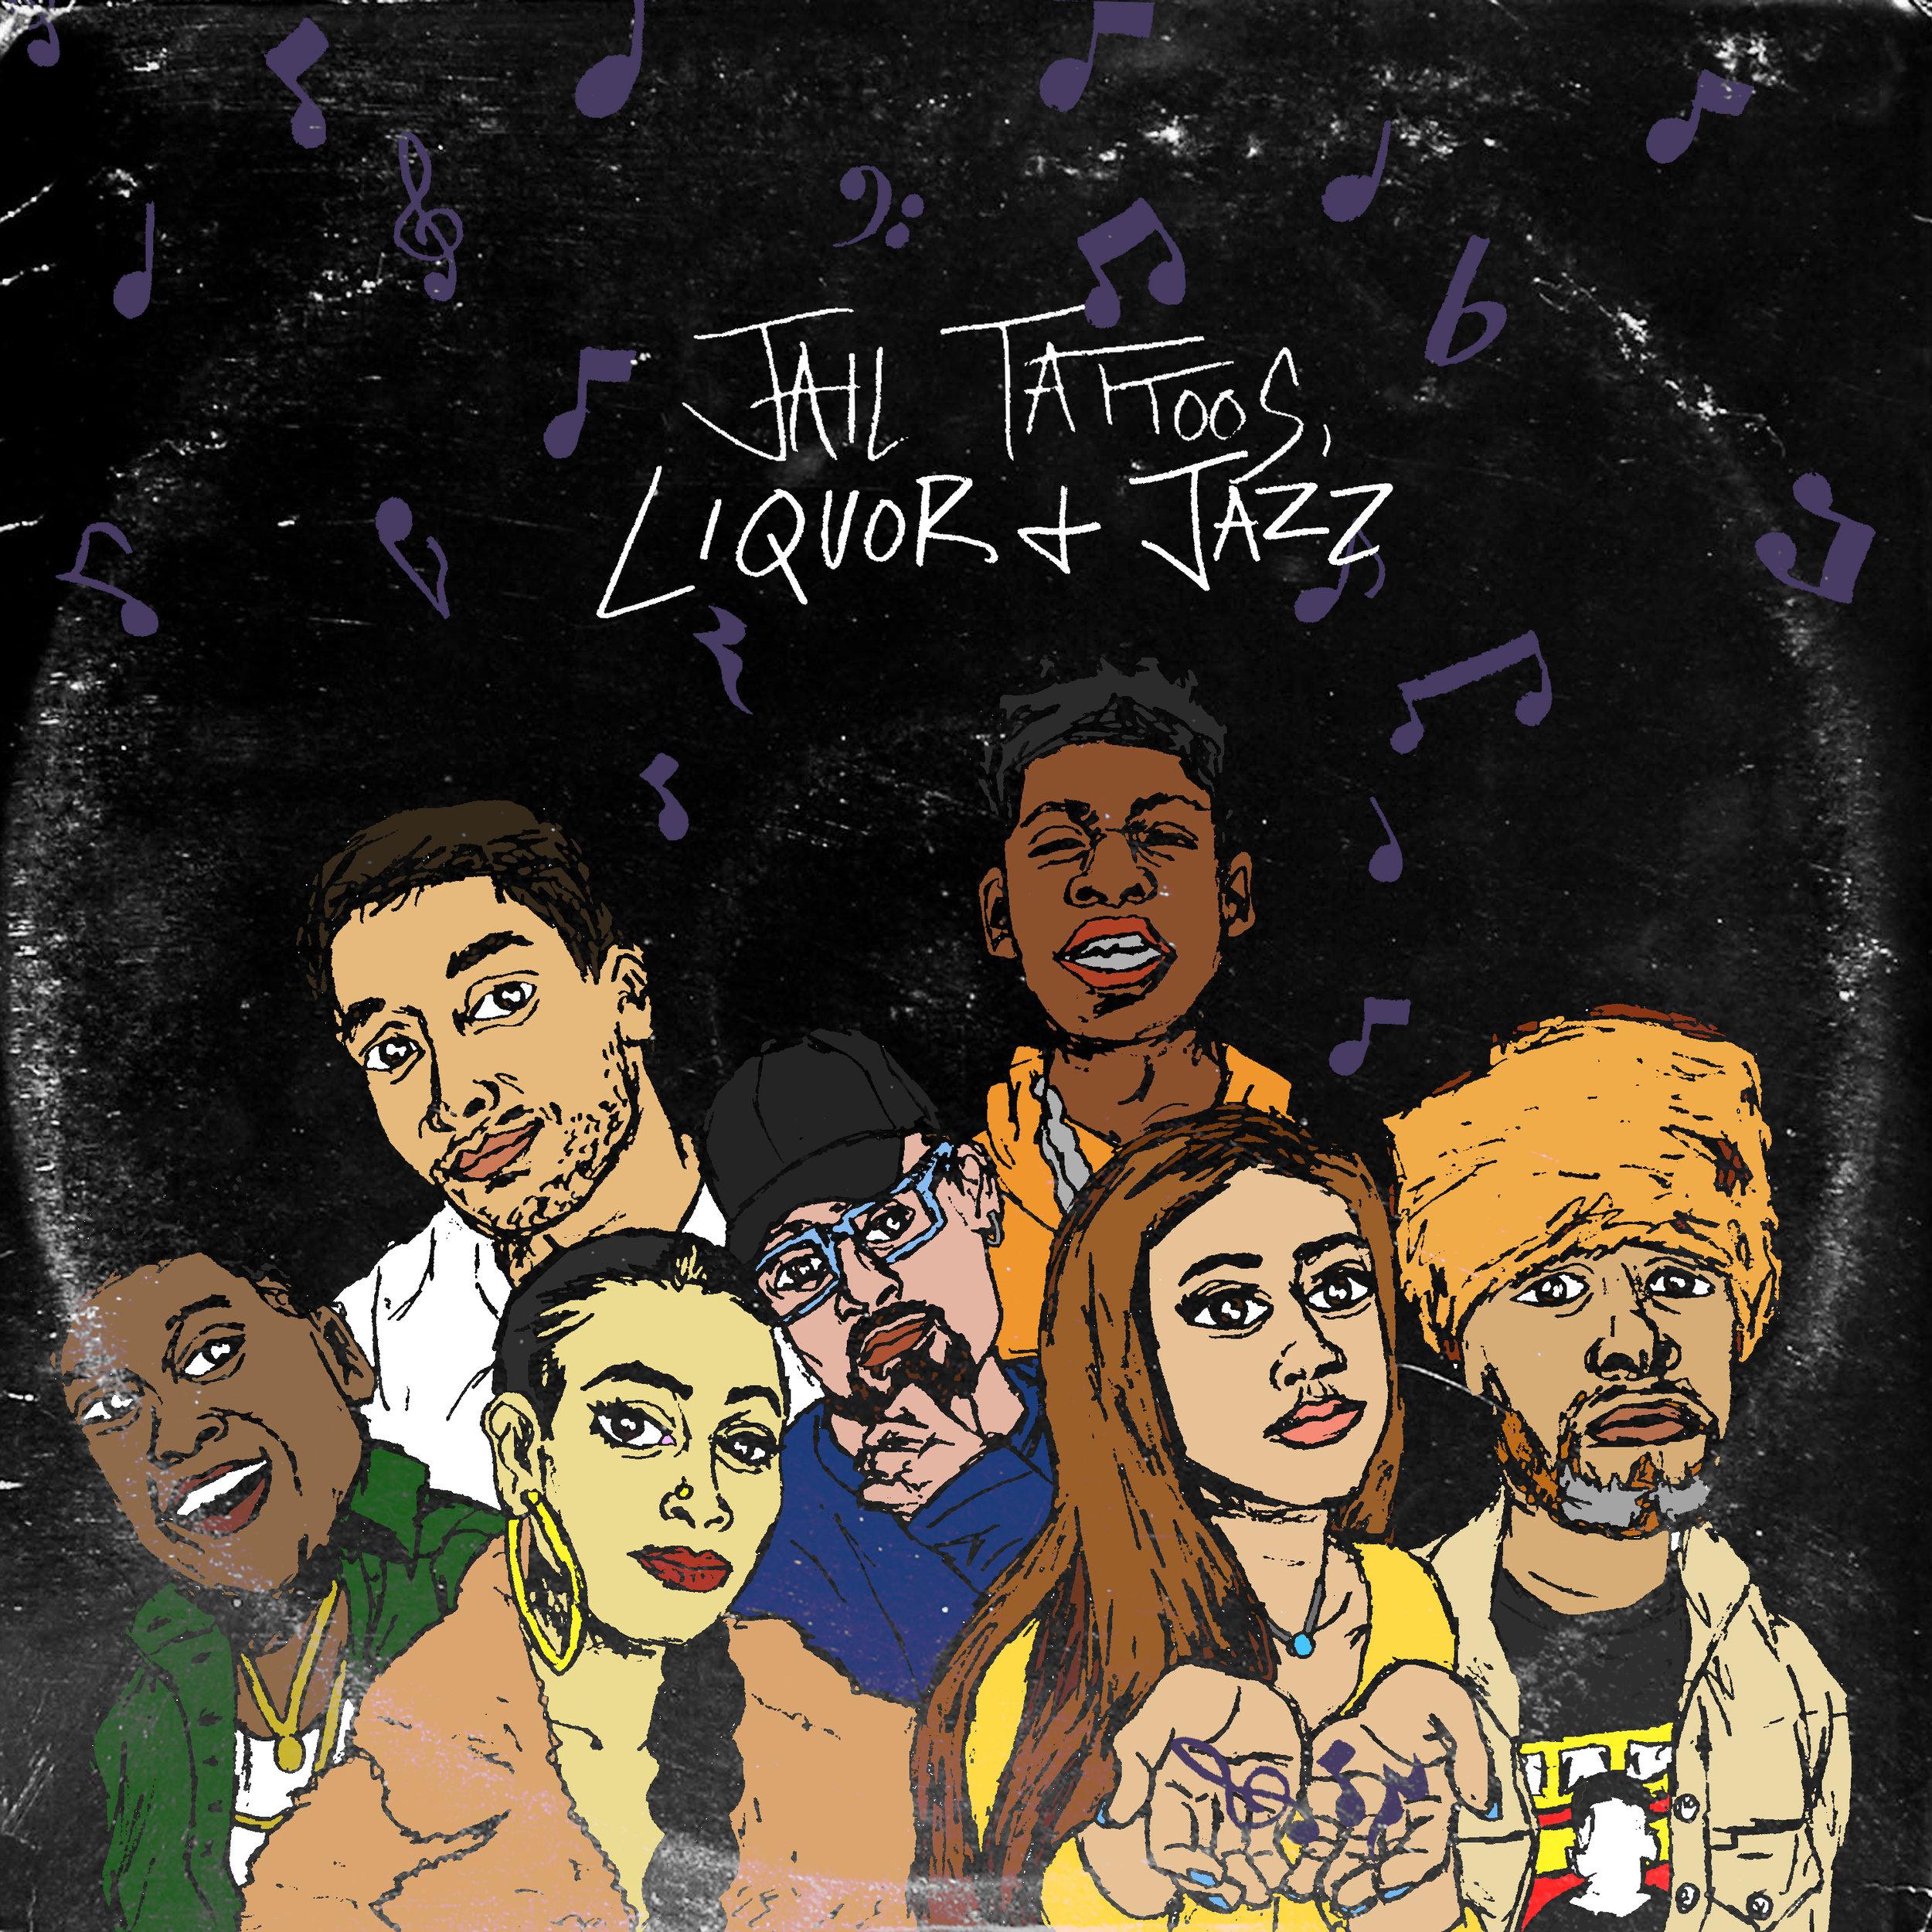 Jail Tattoos, Liquor and Jazz.jpg